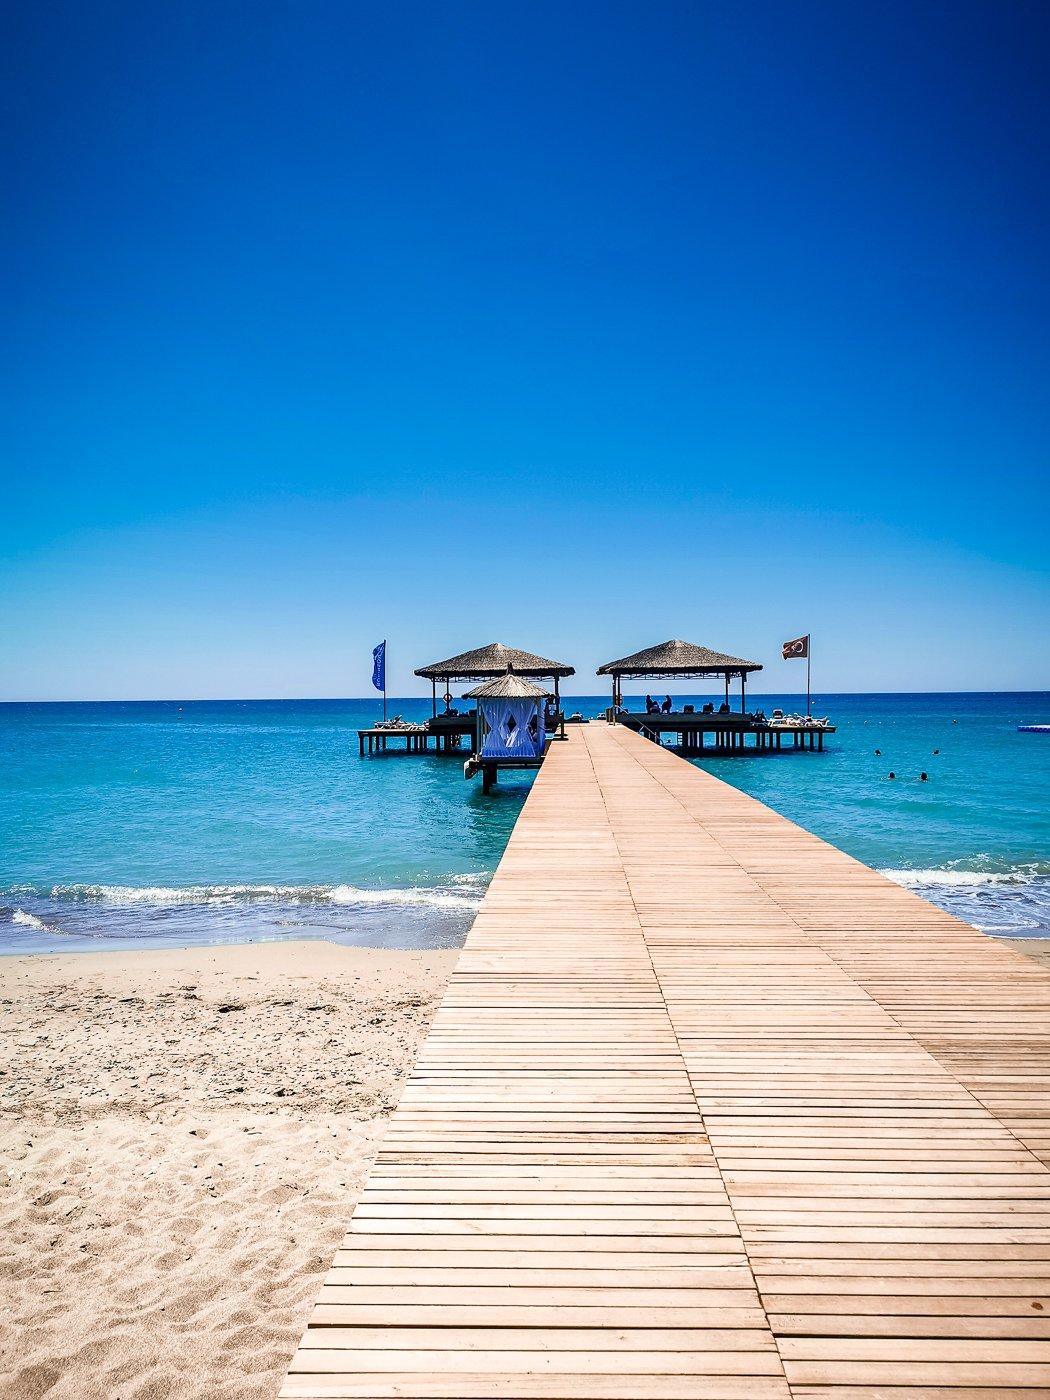 conny doll lifestyle: Beachflair, Türkei, Robinson Club, Sommer, Sonne, Meer, Nobilis